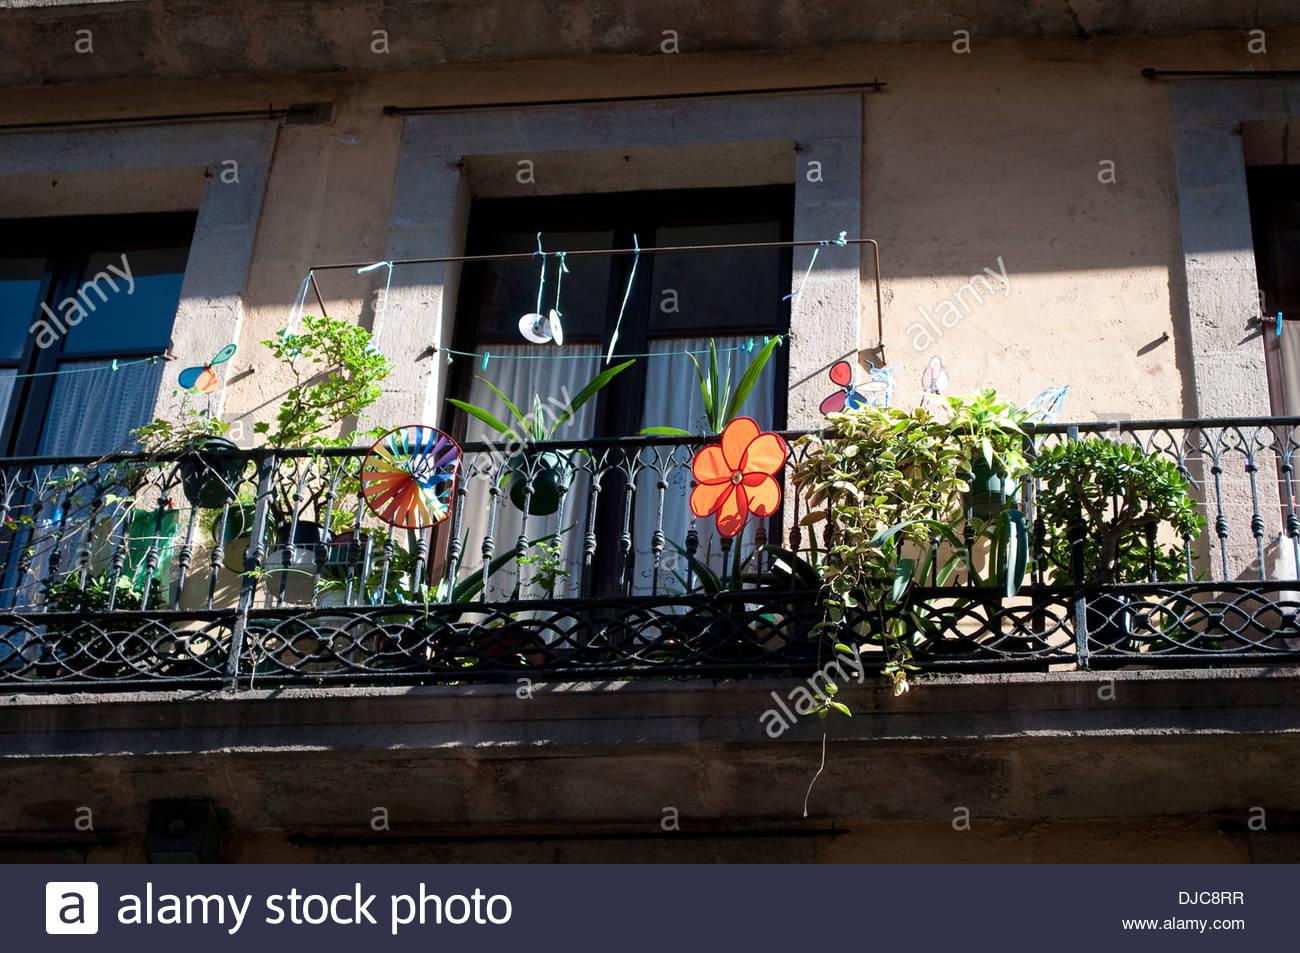 Balcony with flower, Ribera district, Barcelona, Spain - Stock Image